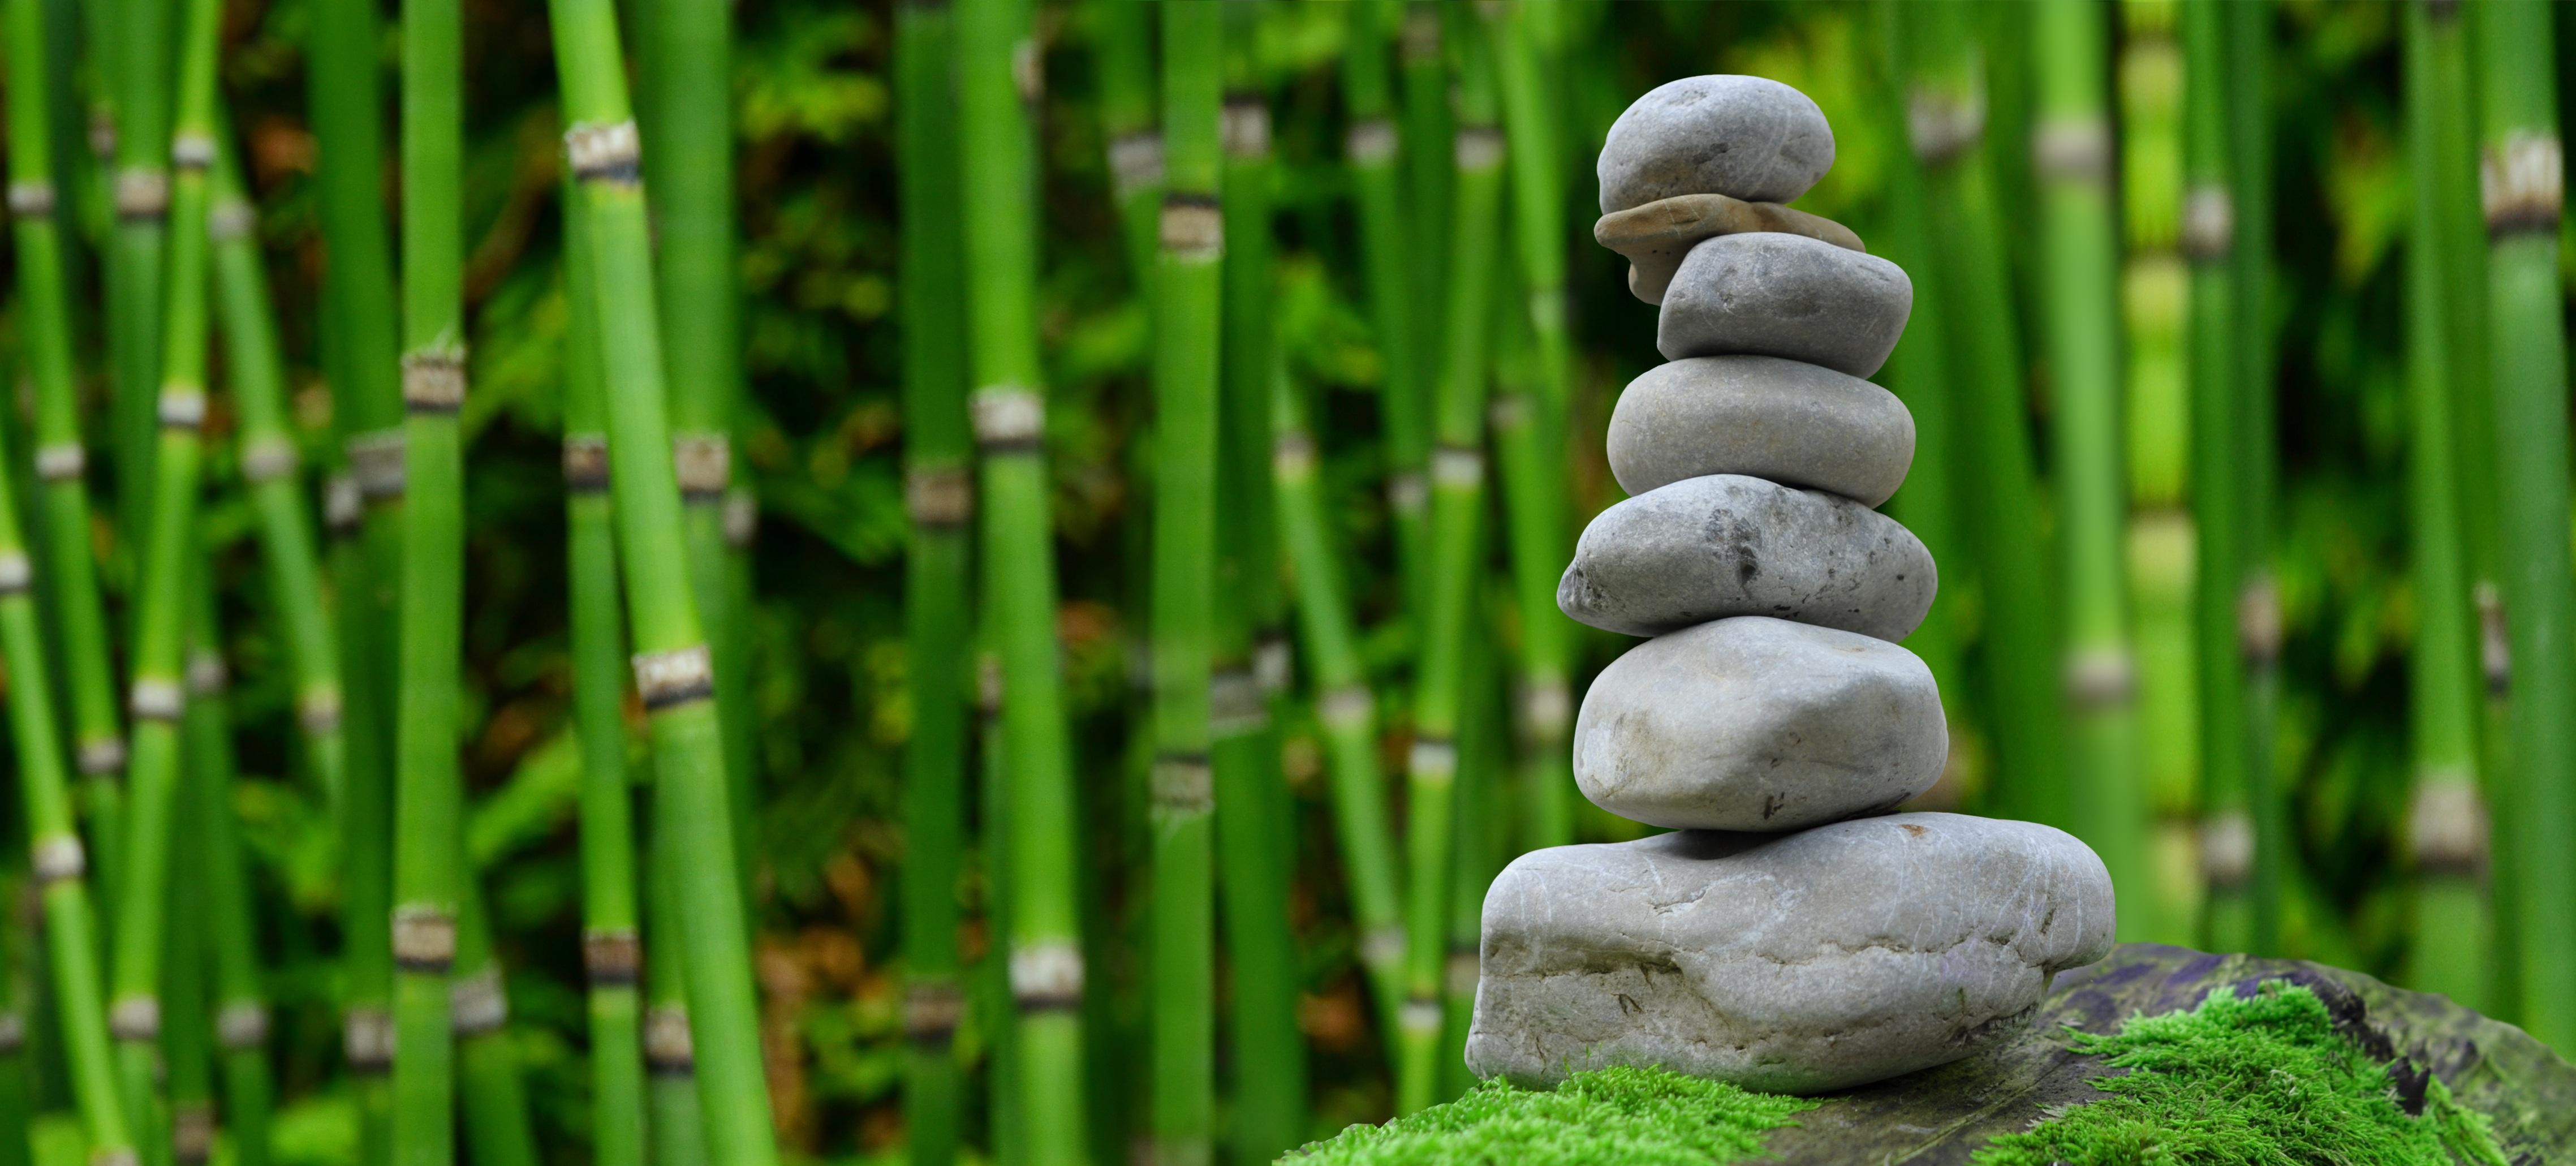 Free images tree nature forest rock plant lawn leaf flower green pebble park monk meditate asia botany rest japan spiritual japanese garden relaxation figure meditation buddha serenity woodland workwithnaturefo